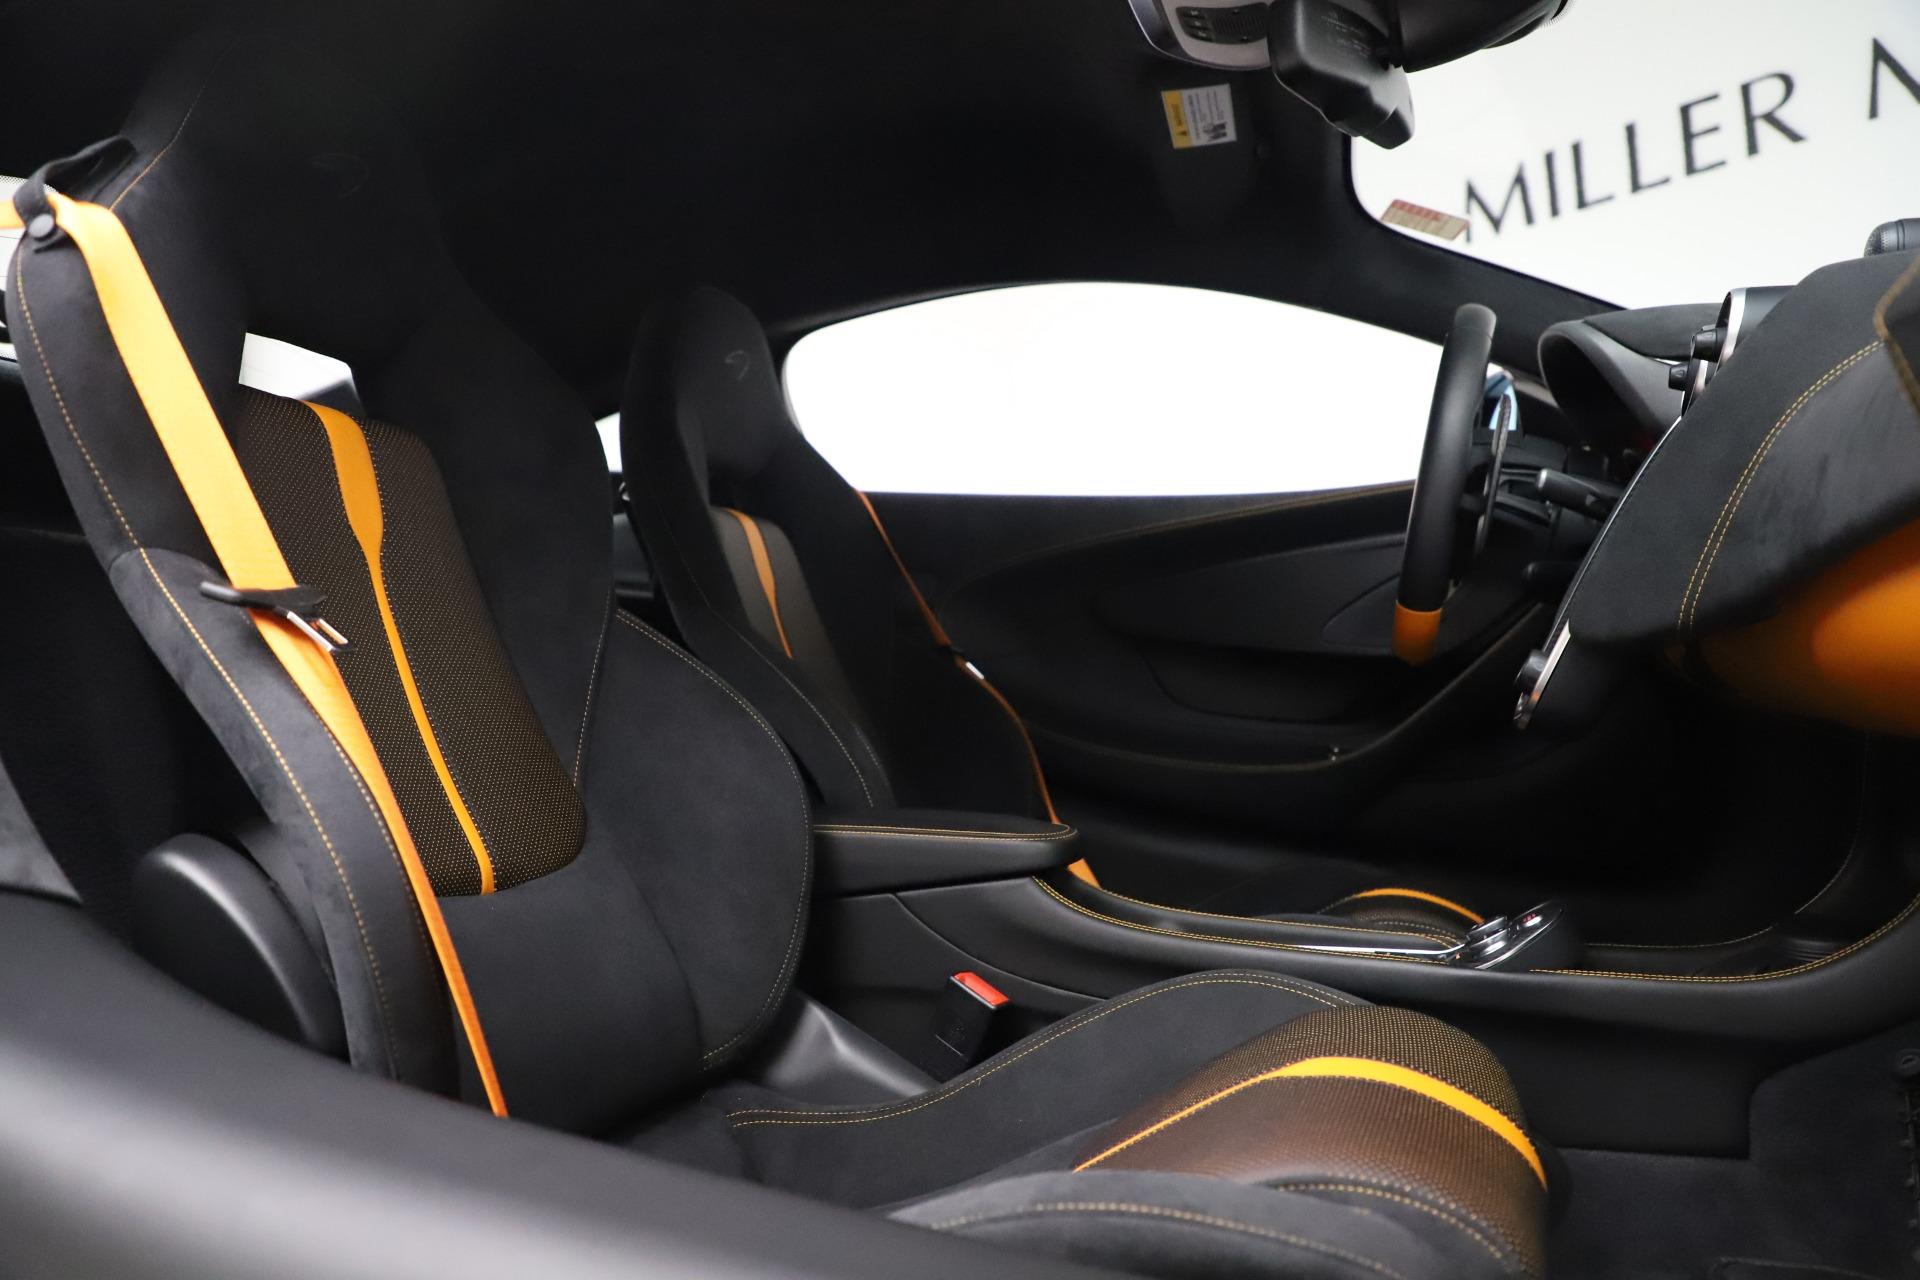 Used 2017 McLaren 570S Coupe For Sale In Westport, CT 3503_p21